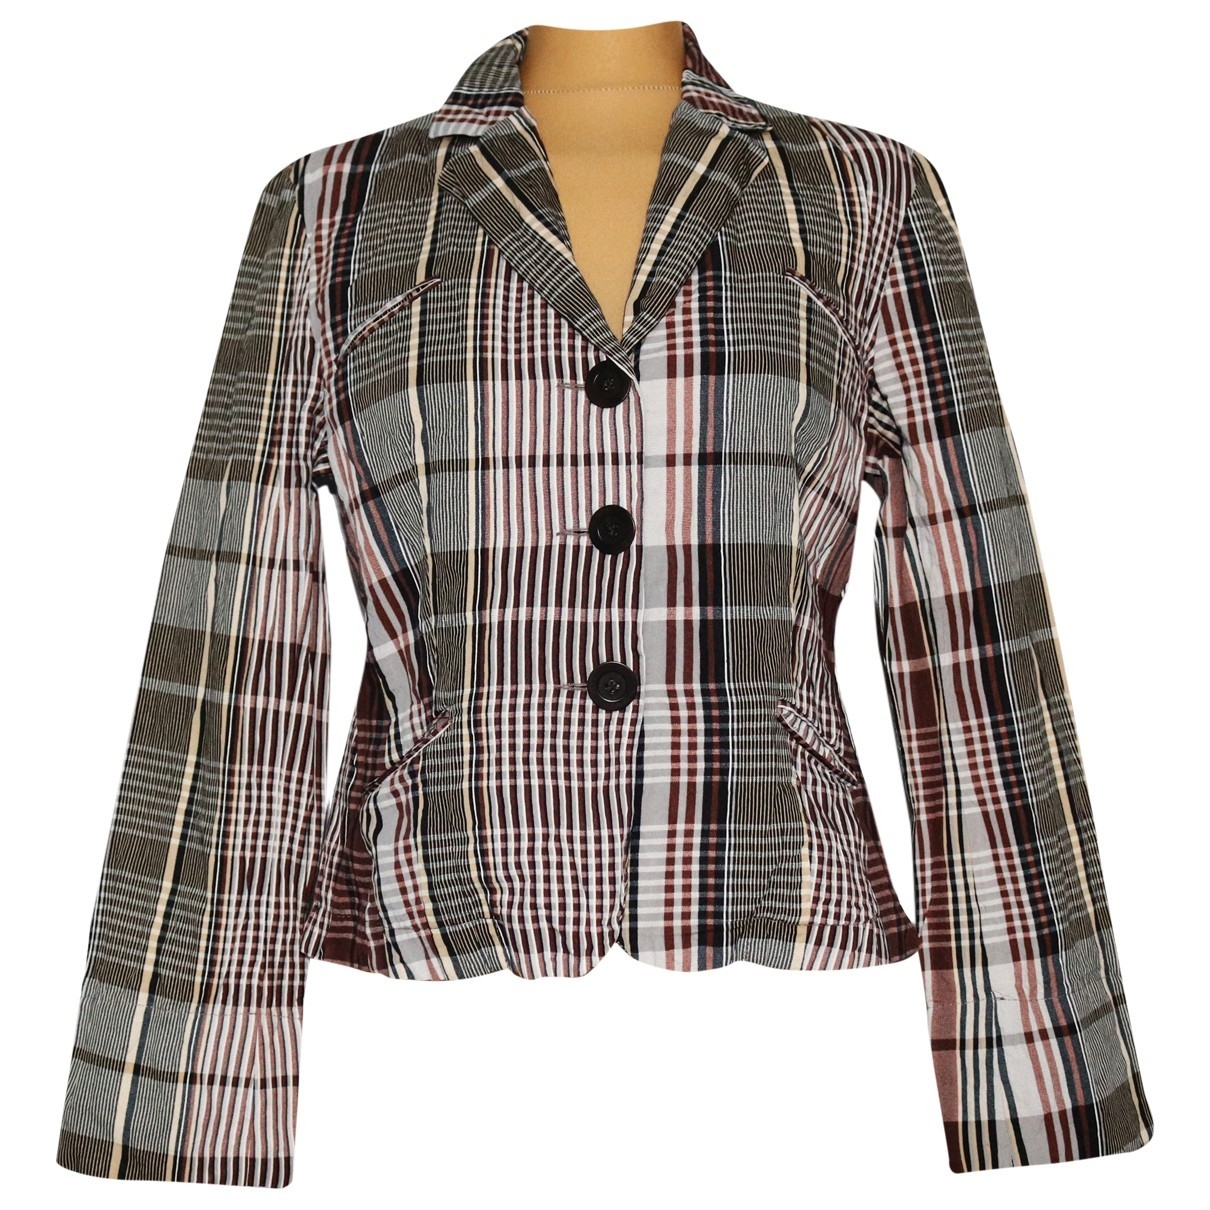 Gerard Darel \N Multicolour Cotton jacket for Women 42 FR